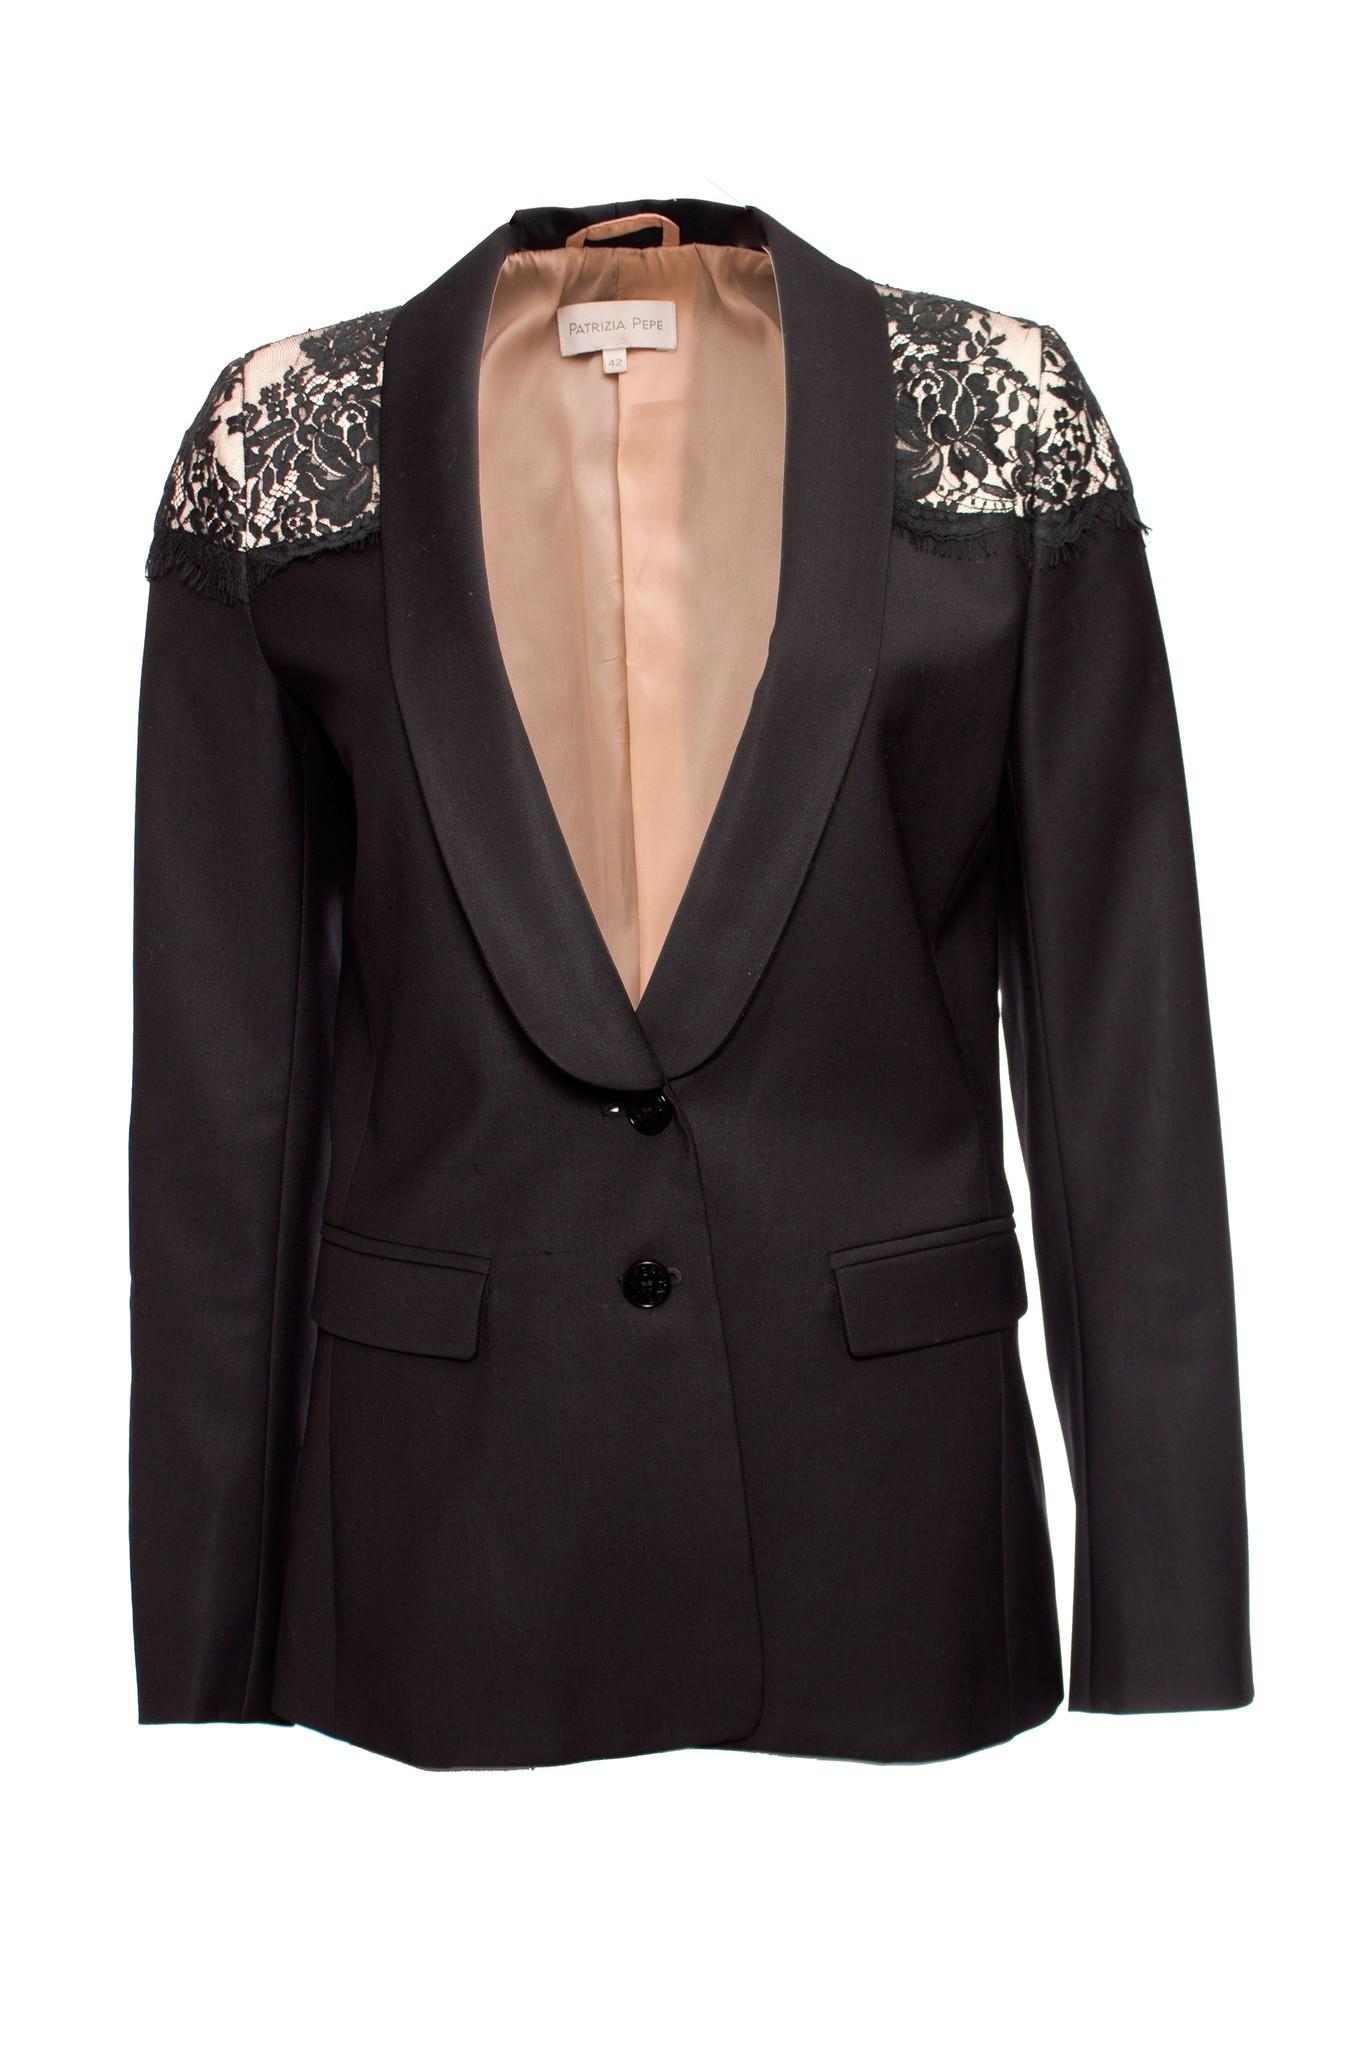 patrizia pepe blazer